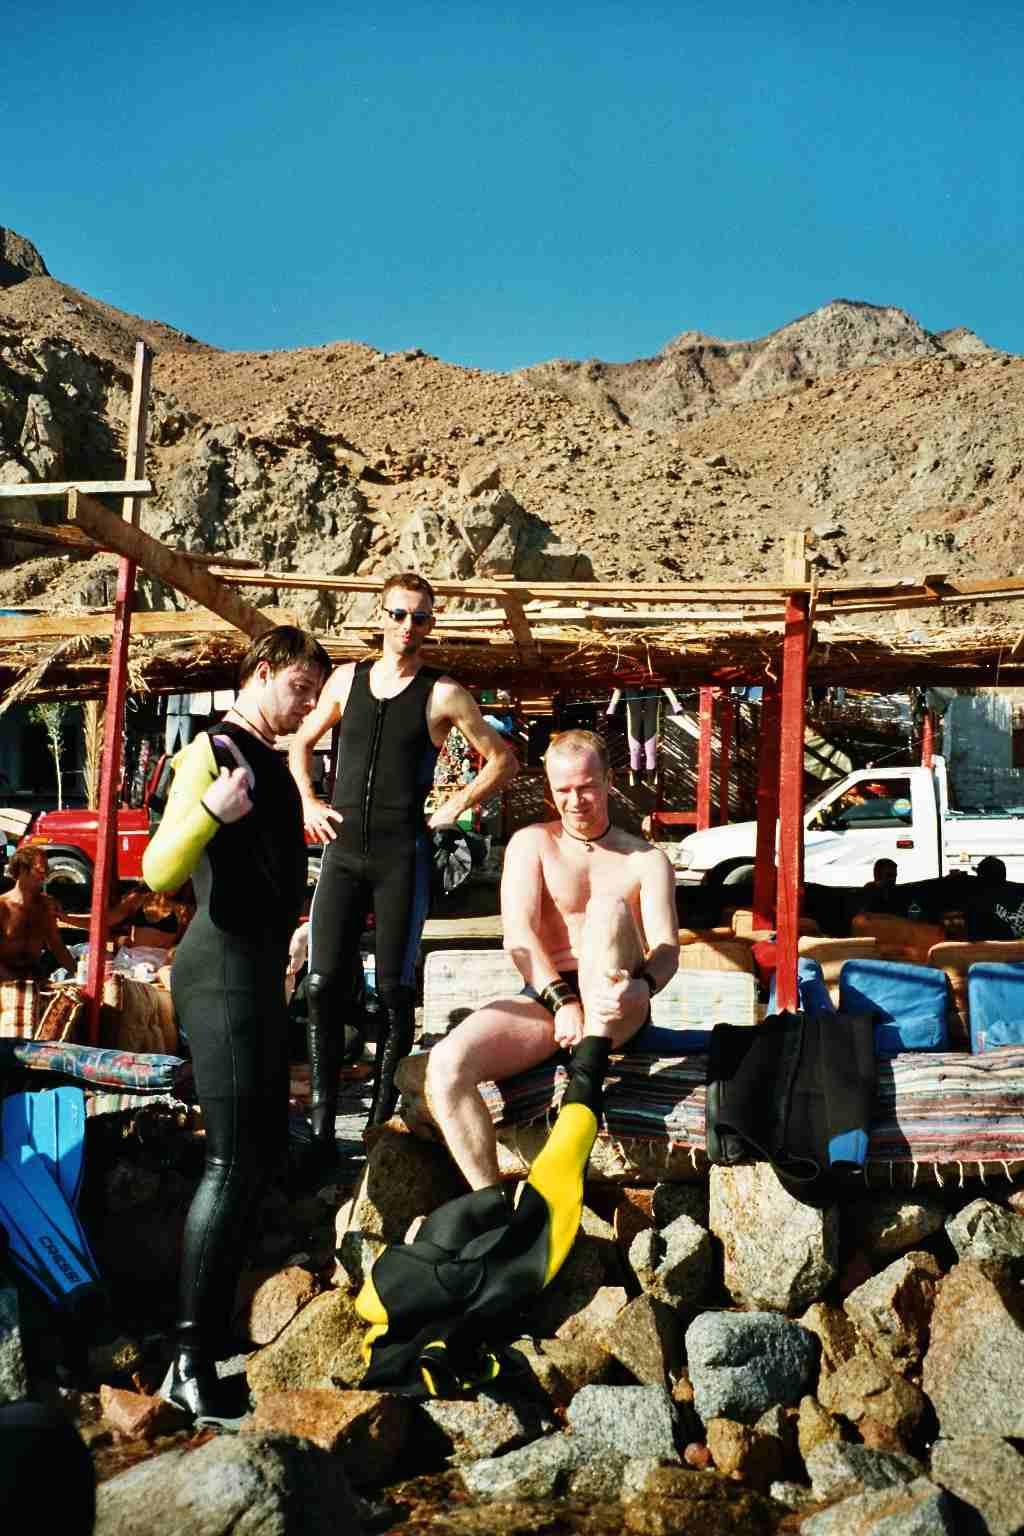 Freediving Camp in Dahab 2003